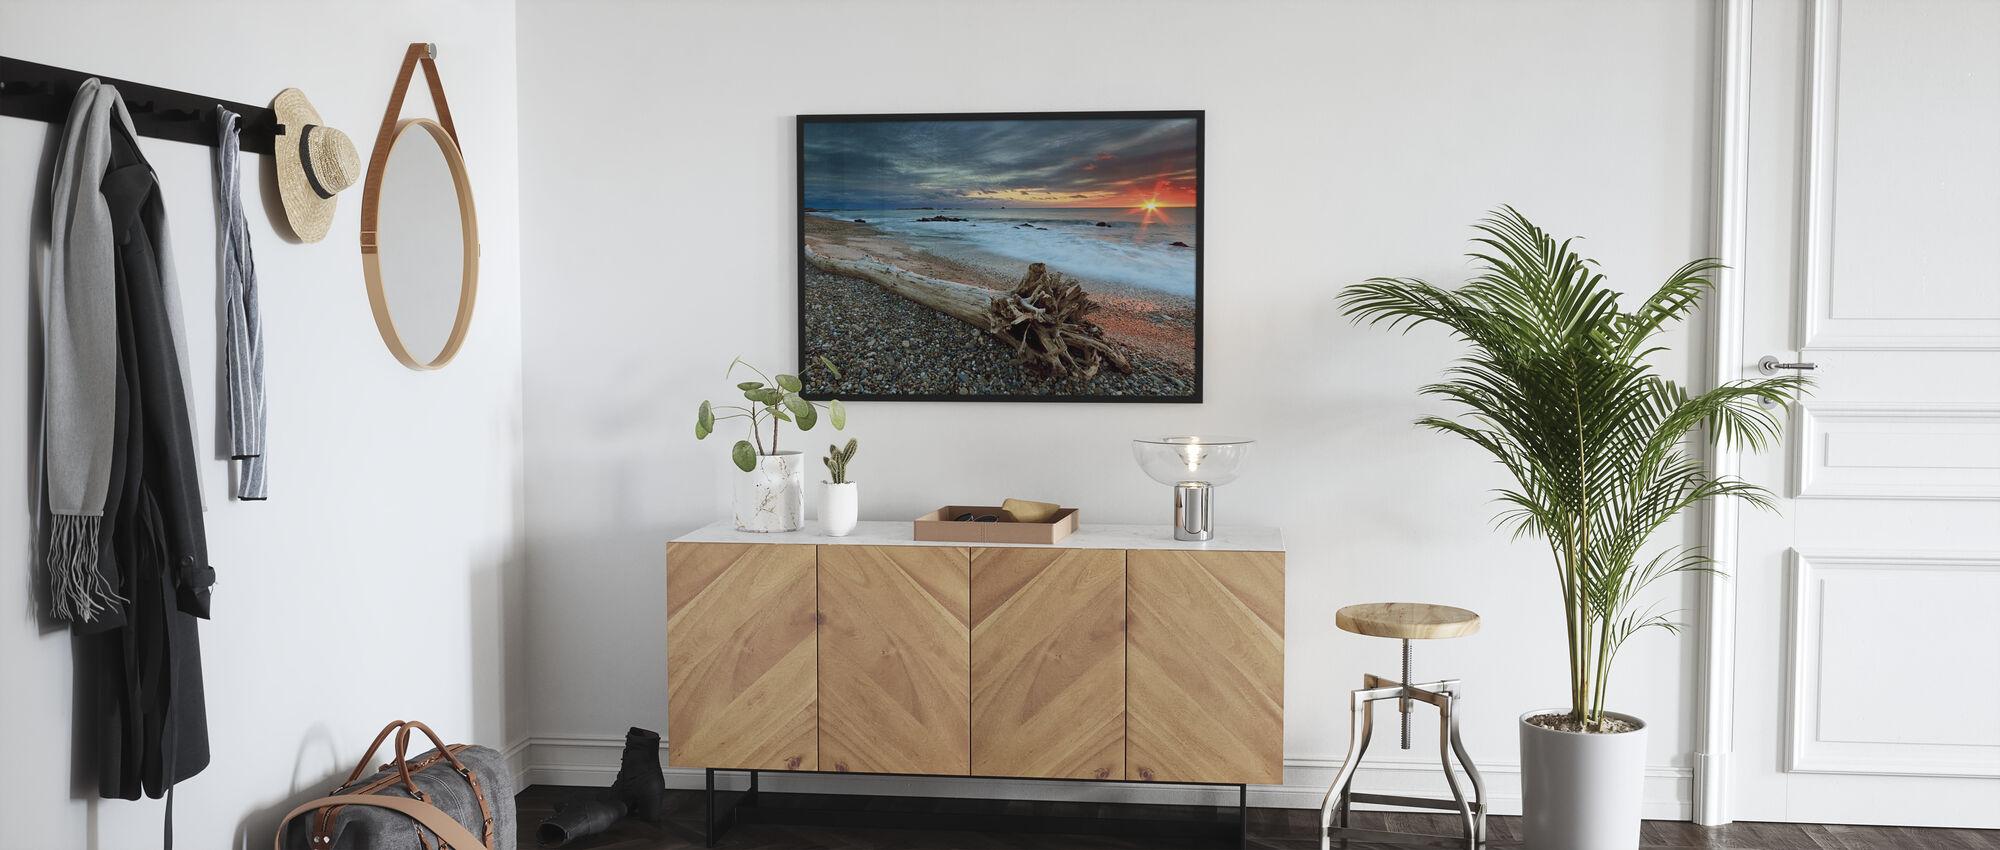 Sakonnet Driftwood - Framed print - Hallway